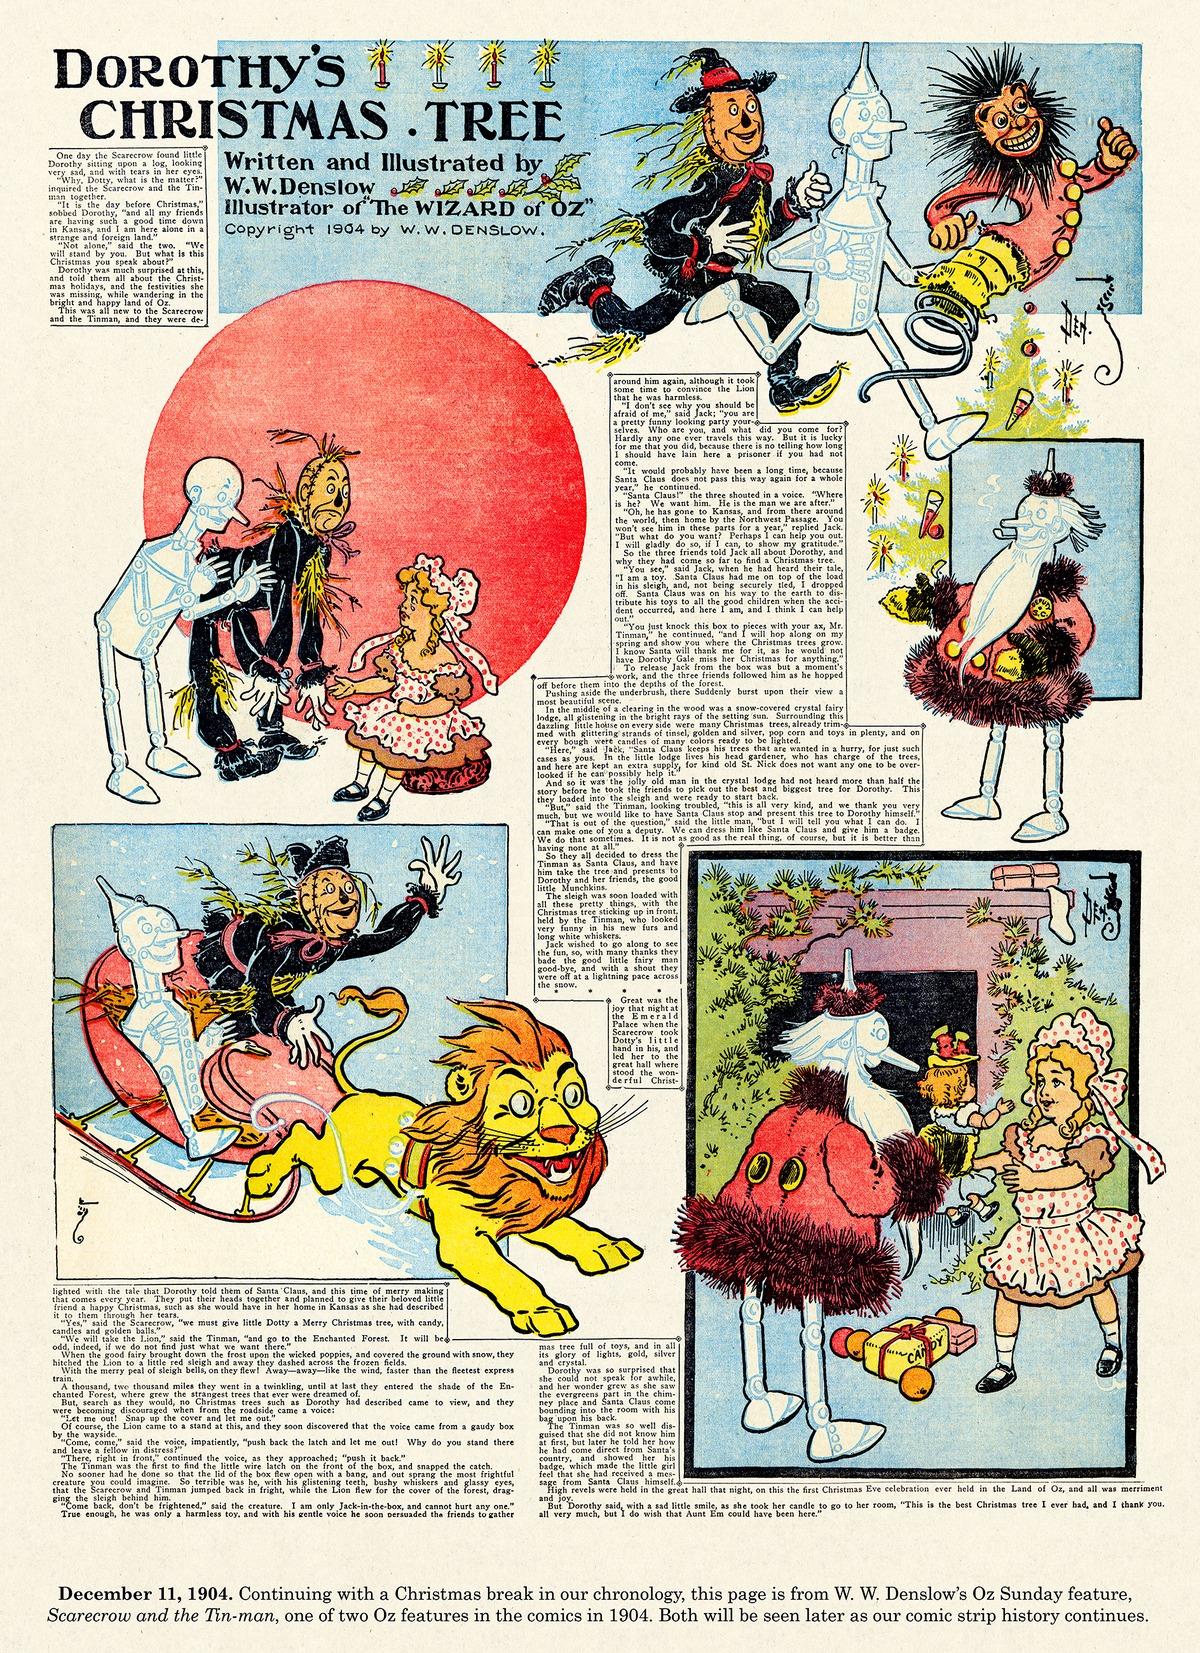 Origins of the Sunday Comics Comic Strip for December 22, 2013